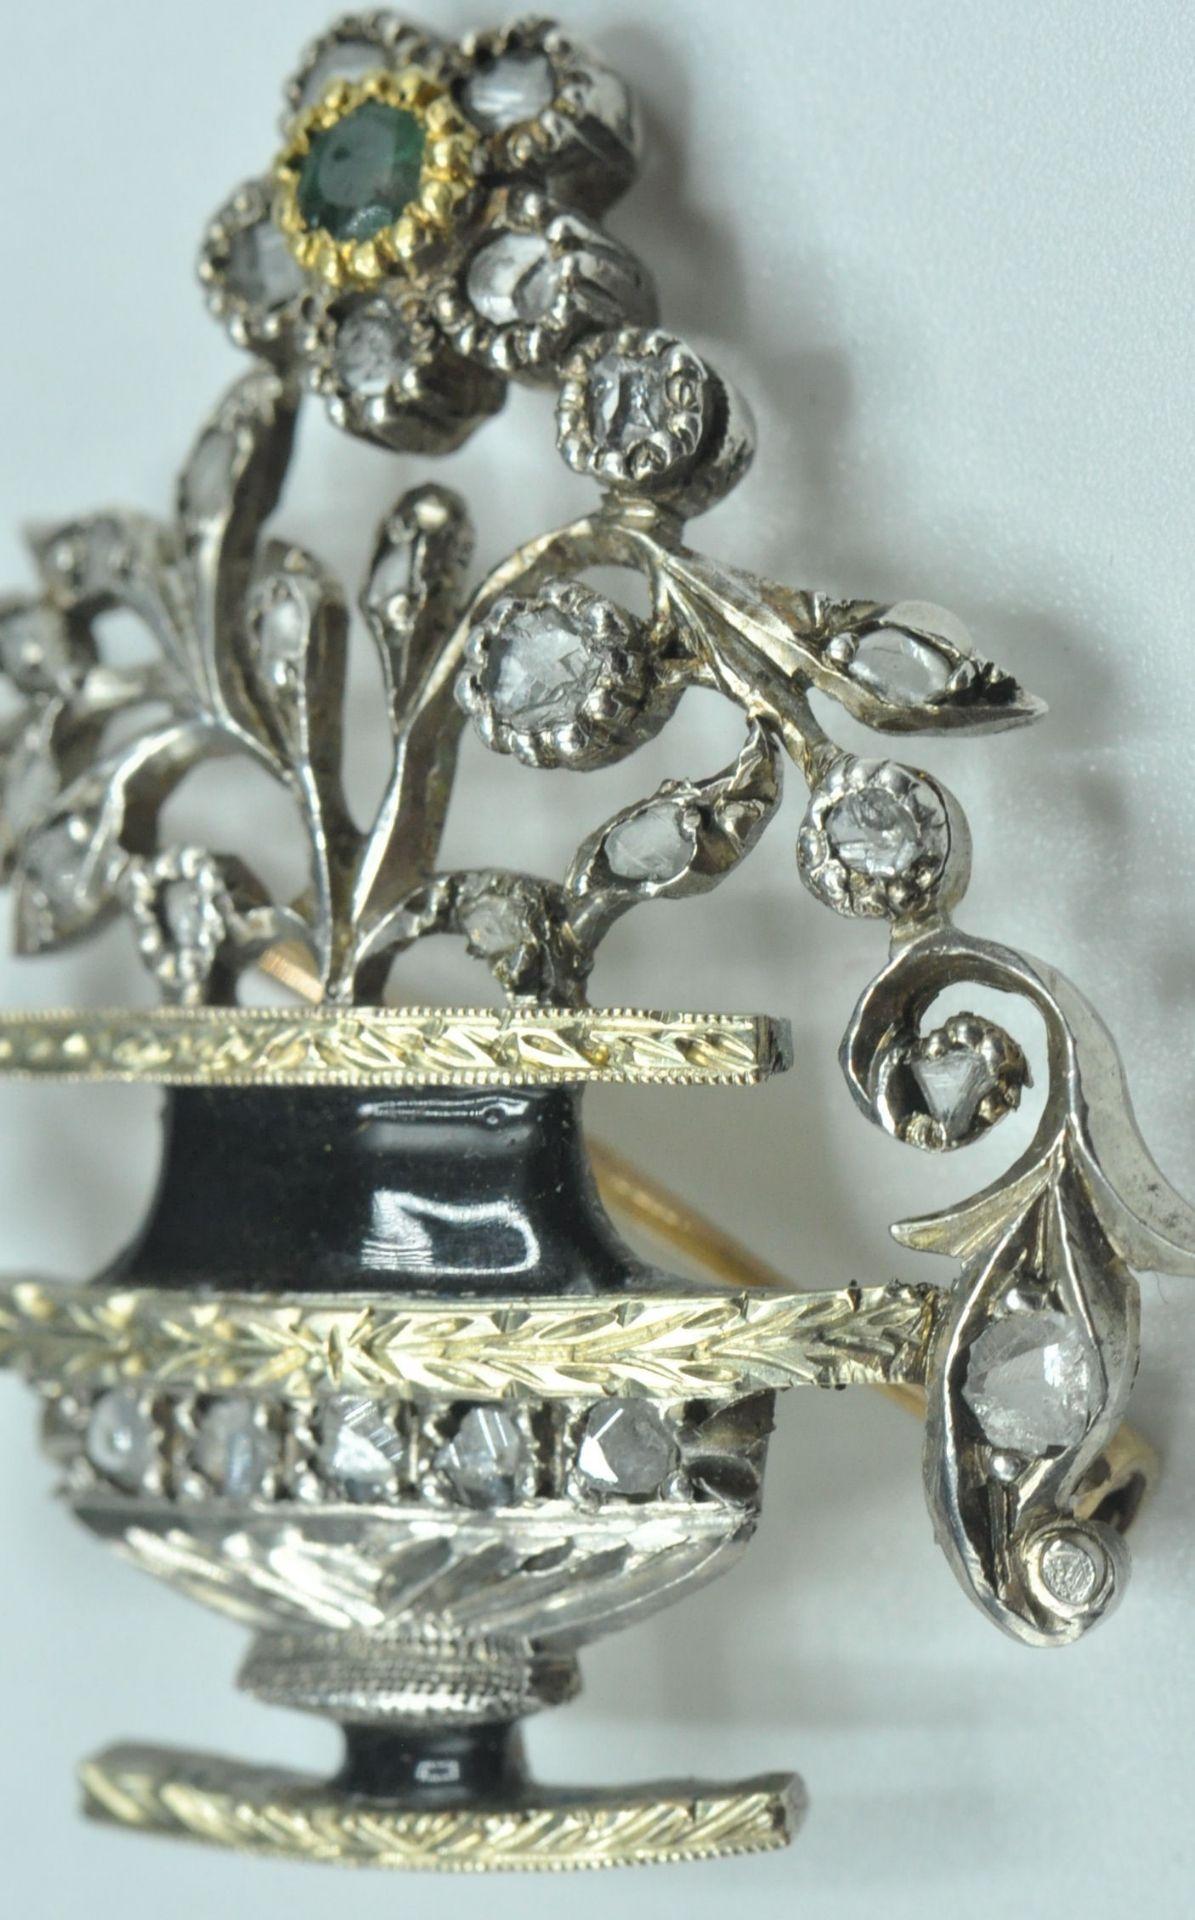 18ct White & Yellow Gold Emerald & Diamond Jardiniere Brooch - Image 2 of 9